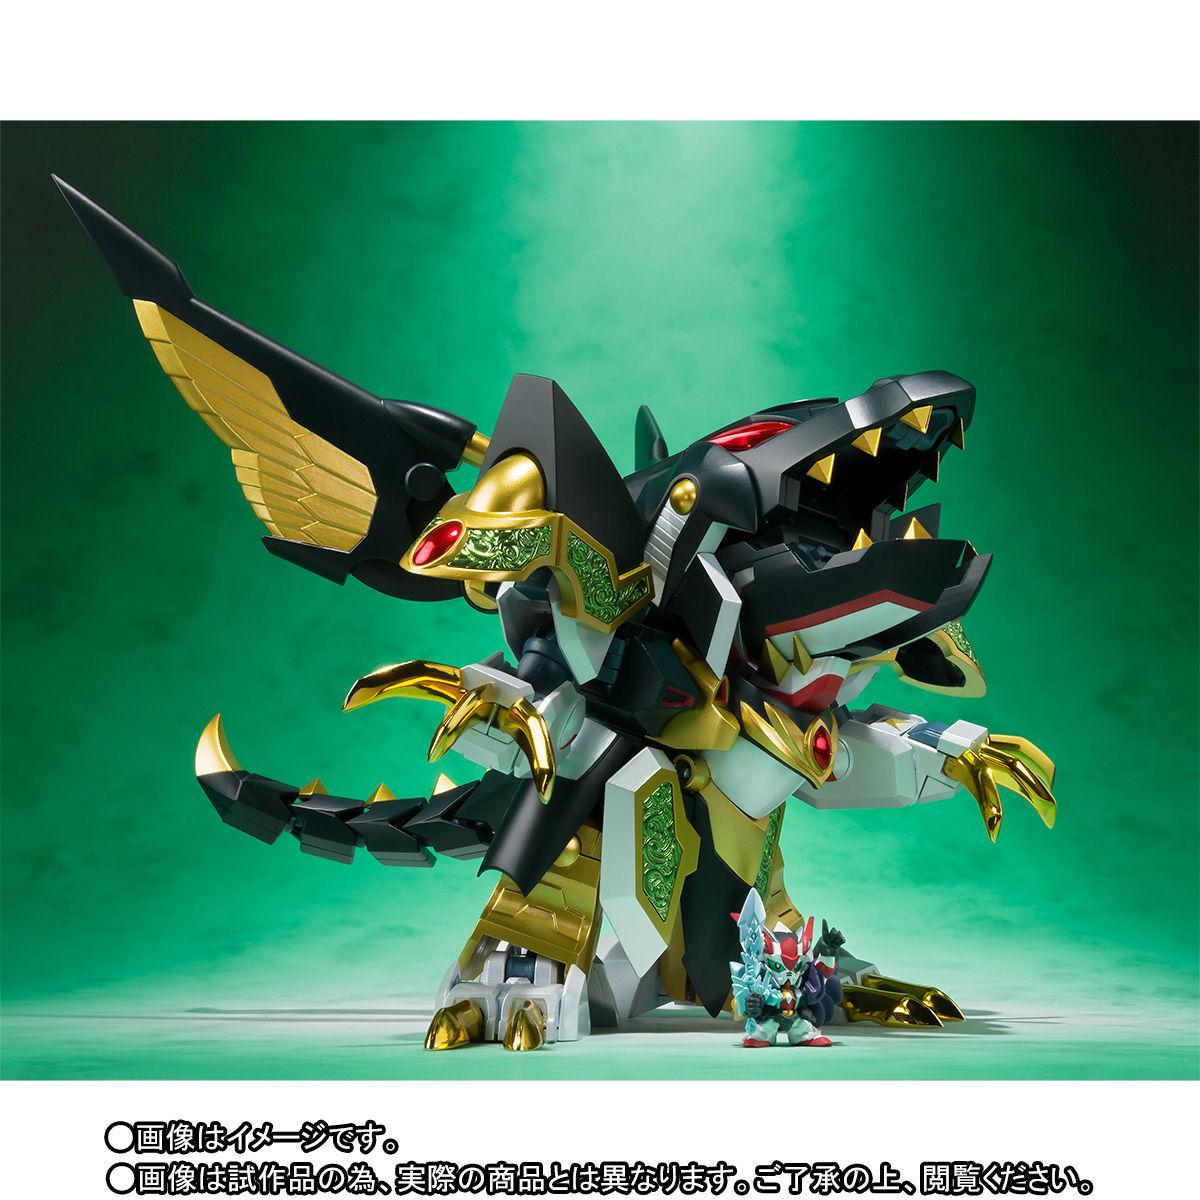 SDX『龍機ドラグーン 新SDガンダム外伝』可変可動フィギュア-006